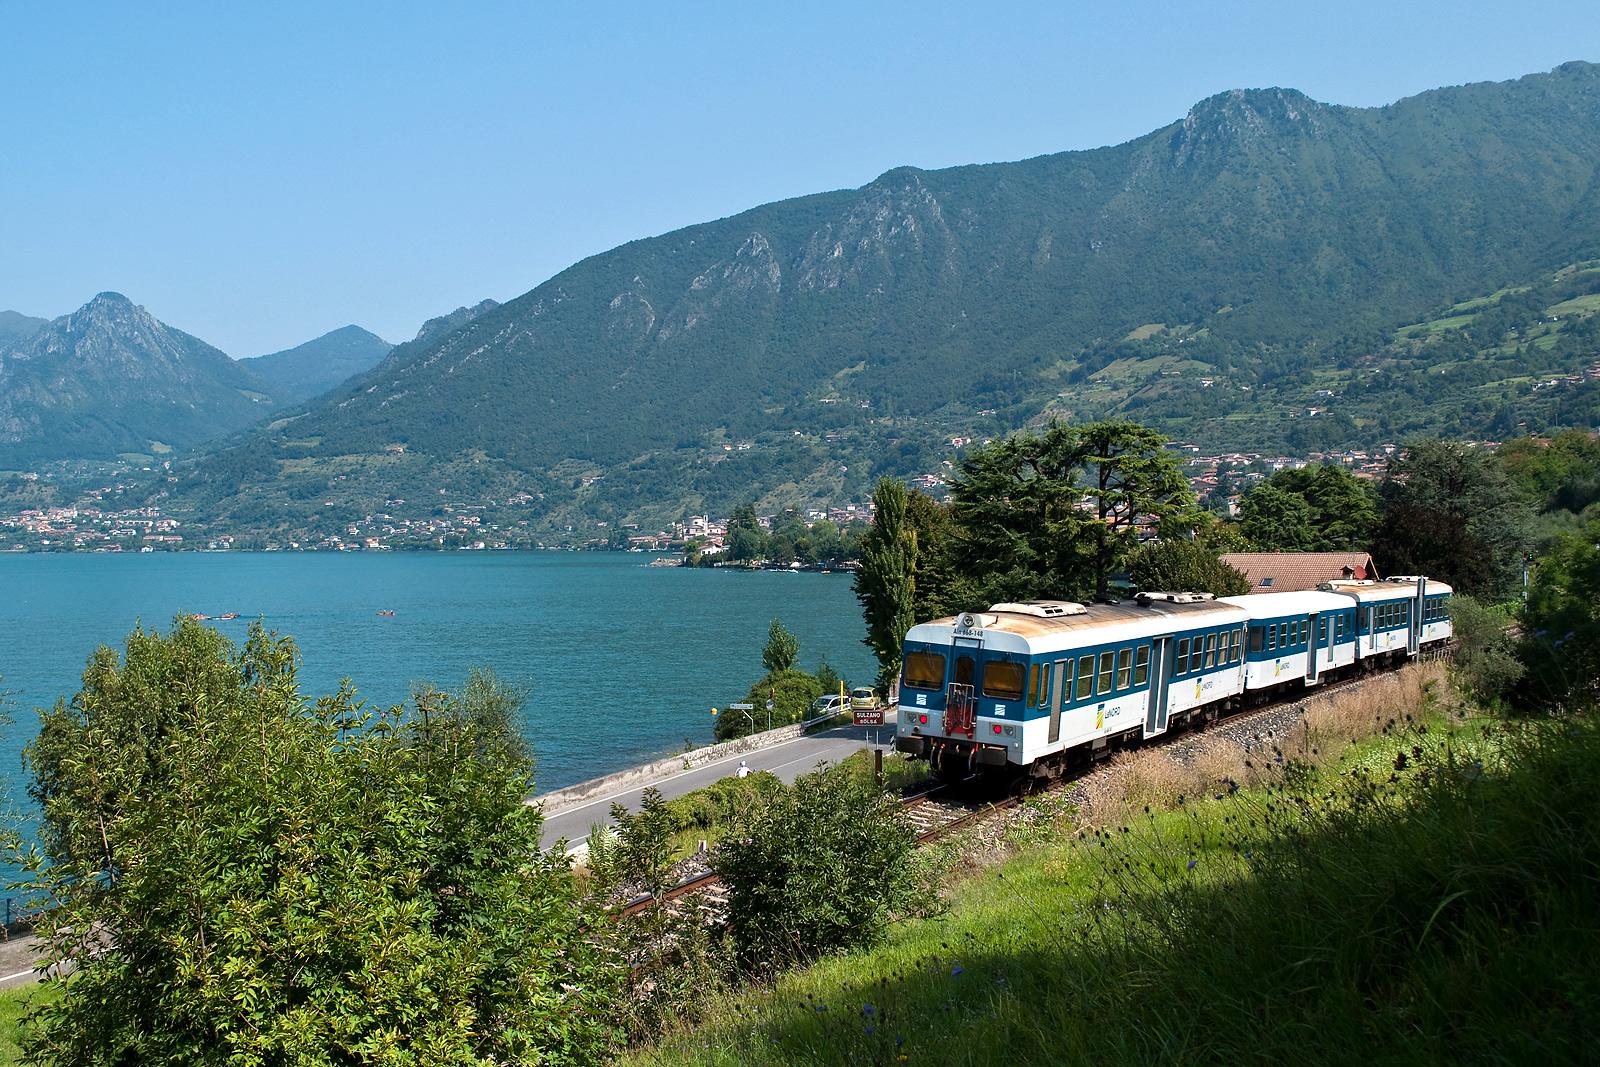 Brescia–Iseo–Edolo-vasútvonal, Sulzano állomás